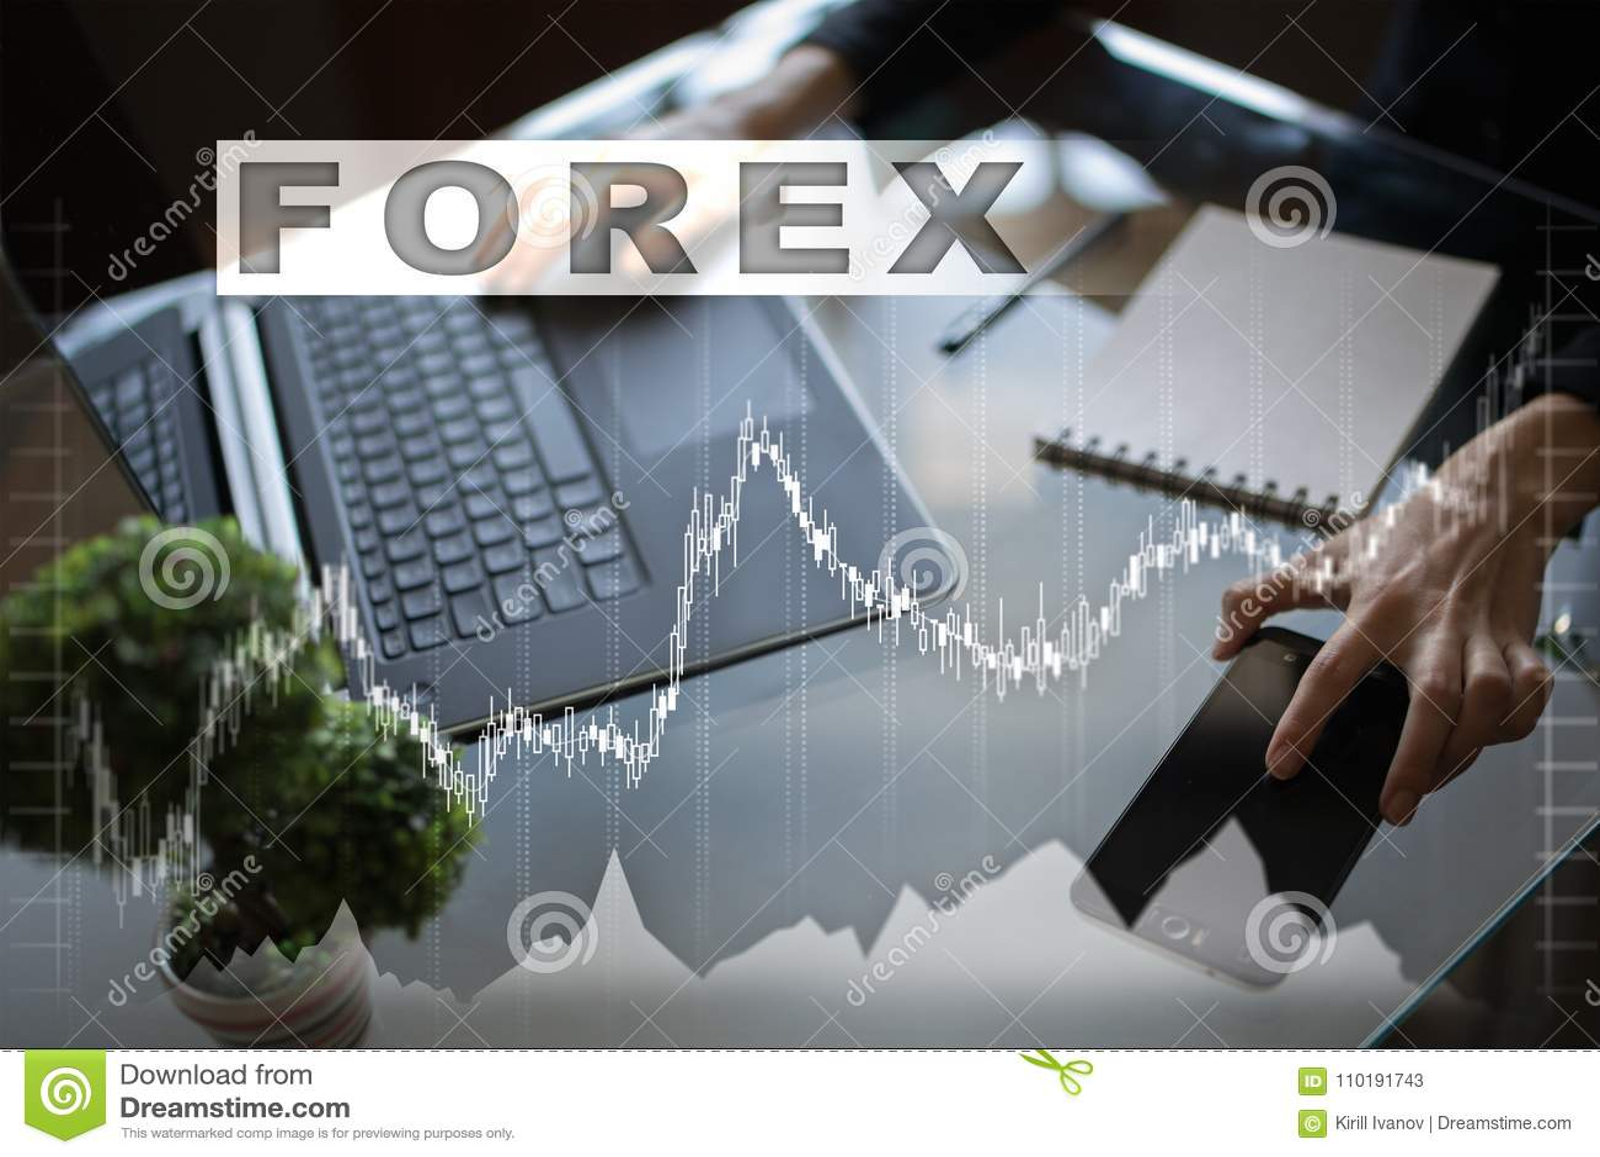 Forex online business